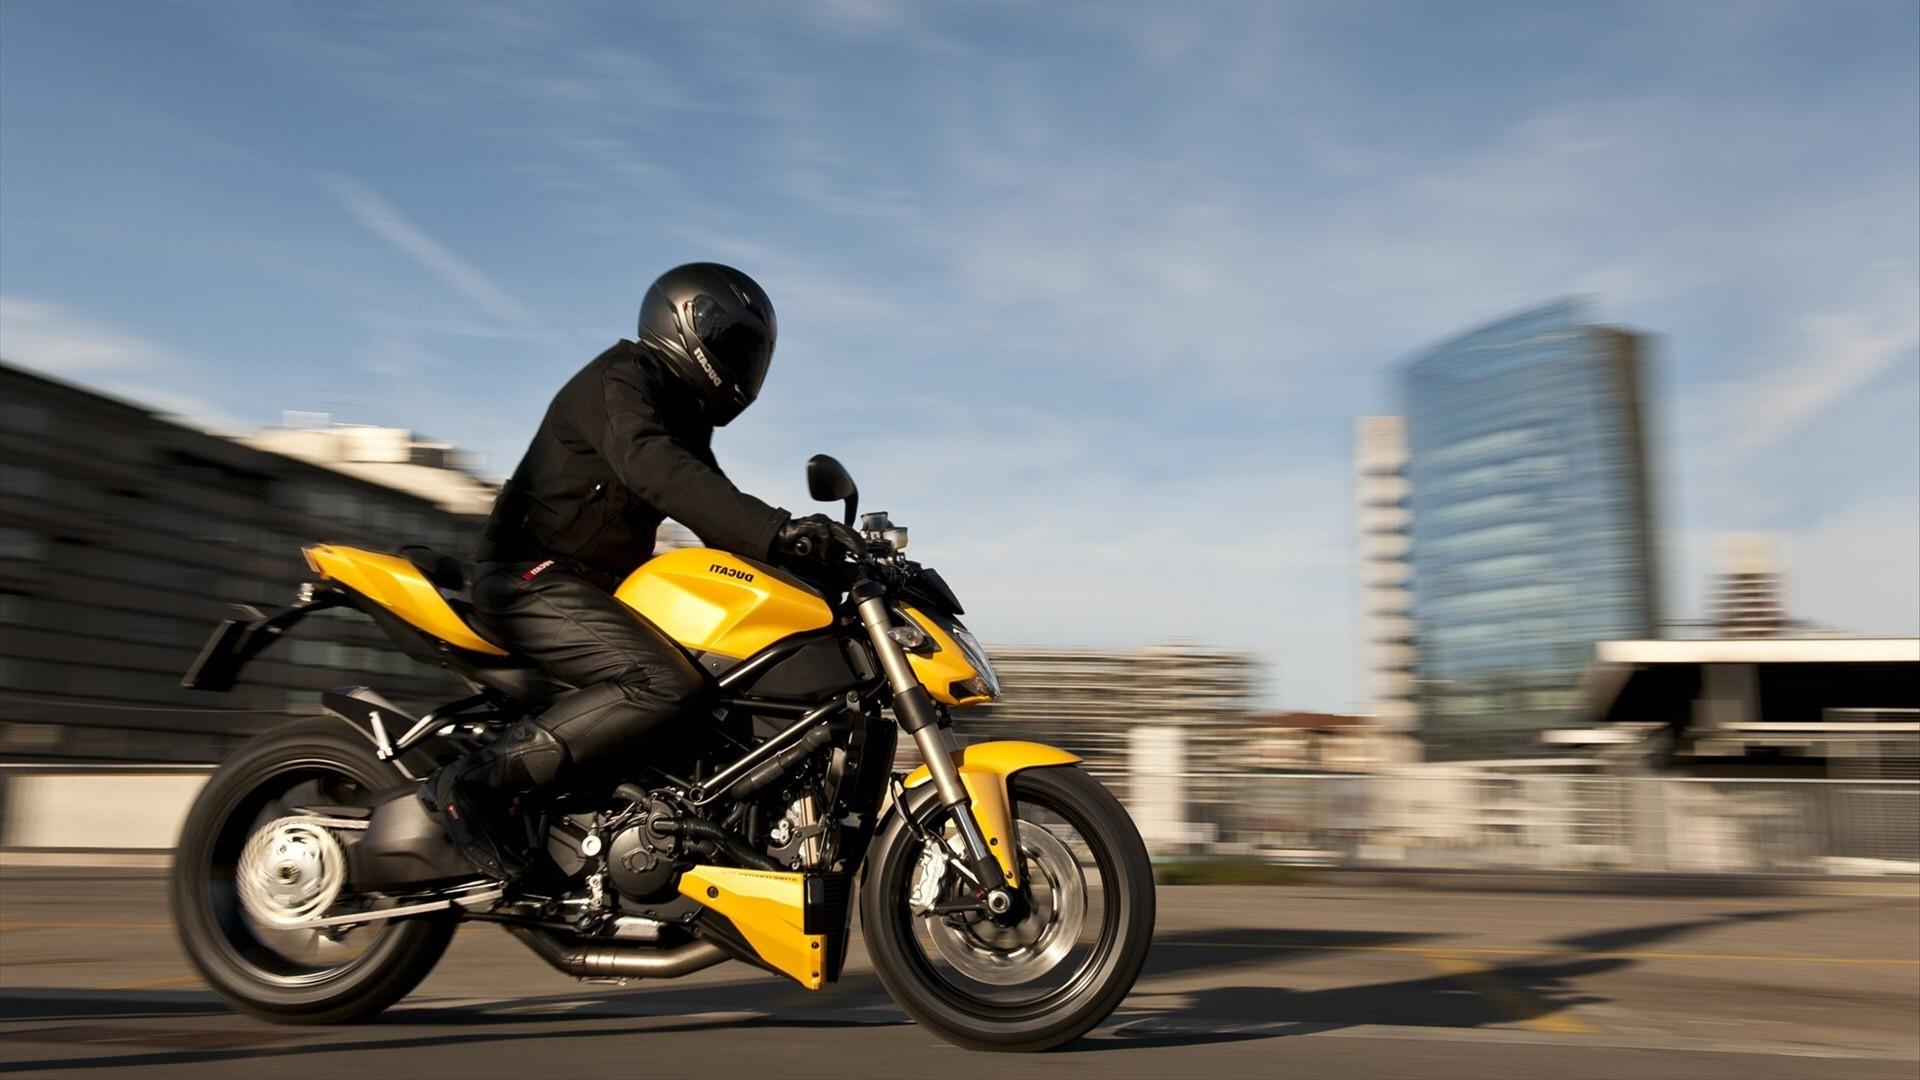 мужчины мотоциклы загрузить